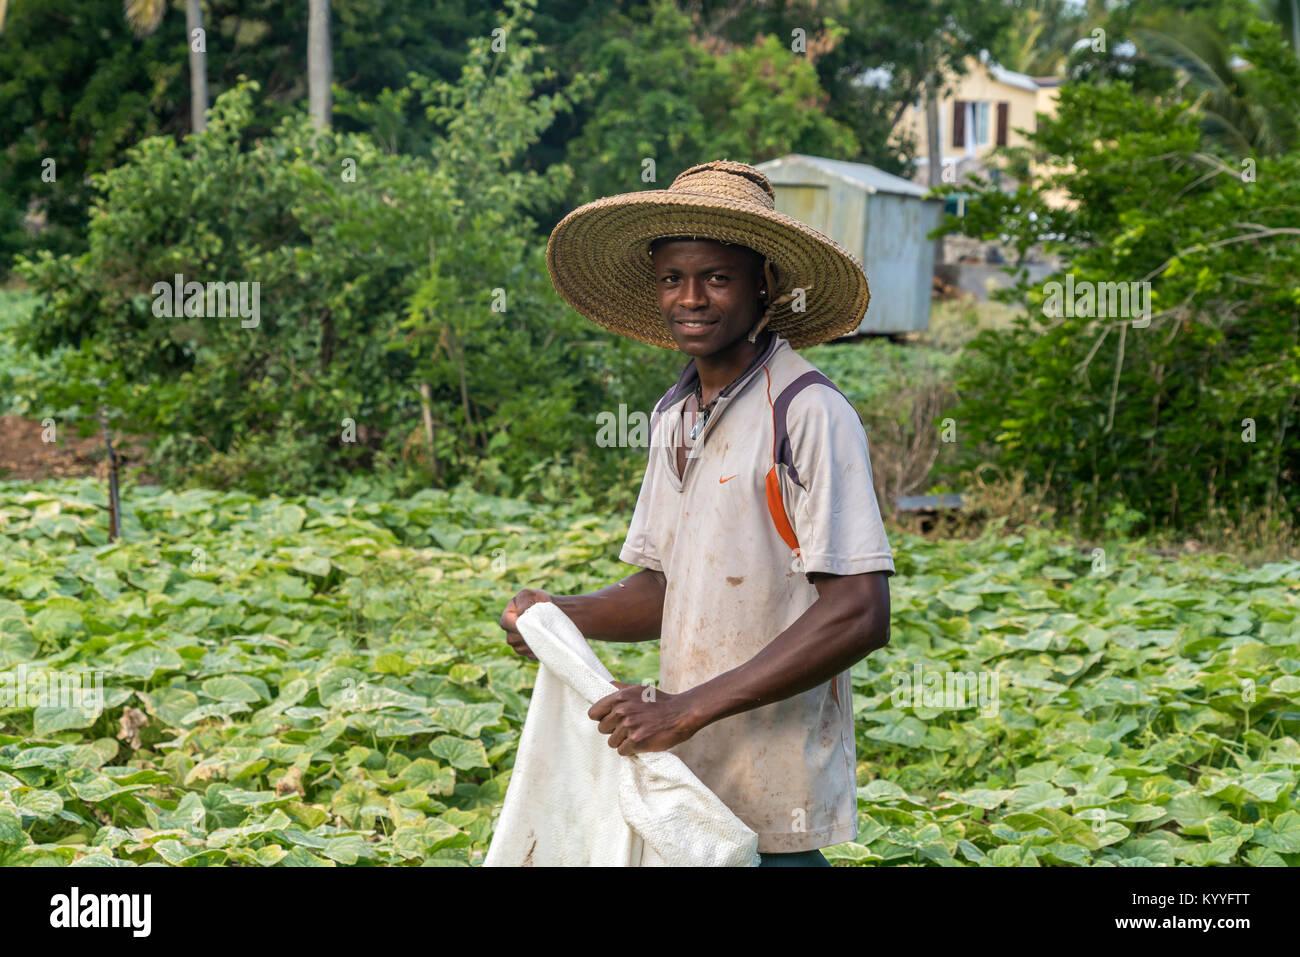 Afrikanischer Bauer auf seinem Feld,  Saint Francois, Insel Rodrigues, Mauritius, Afrika,  | african farmer on his - Stock Image